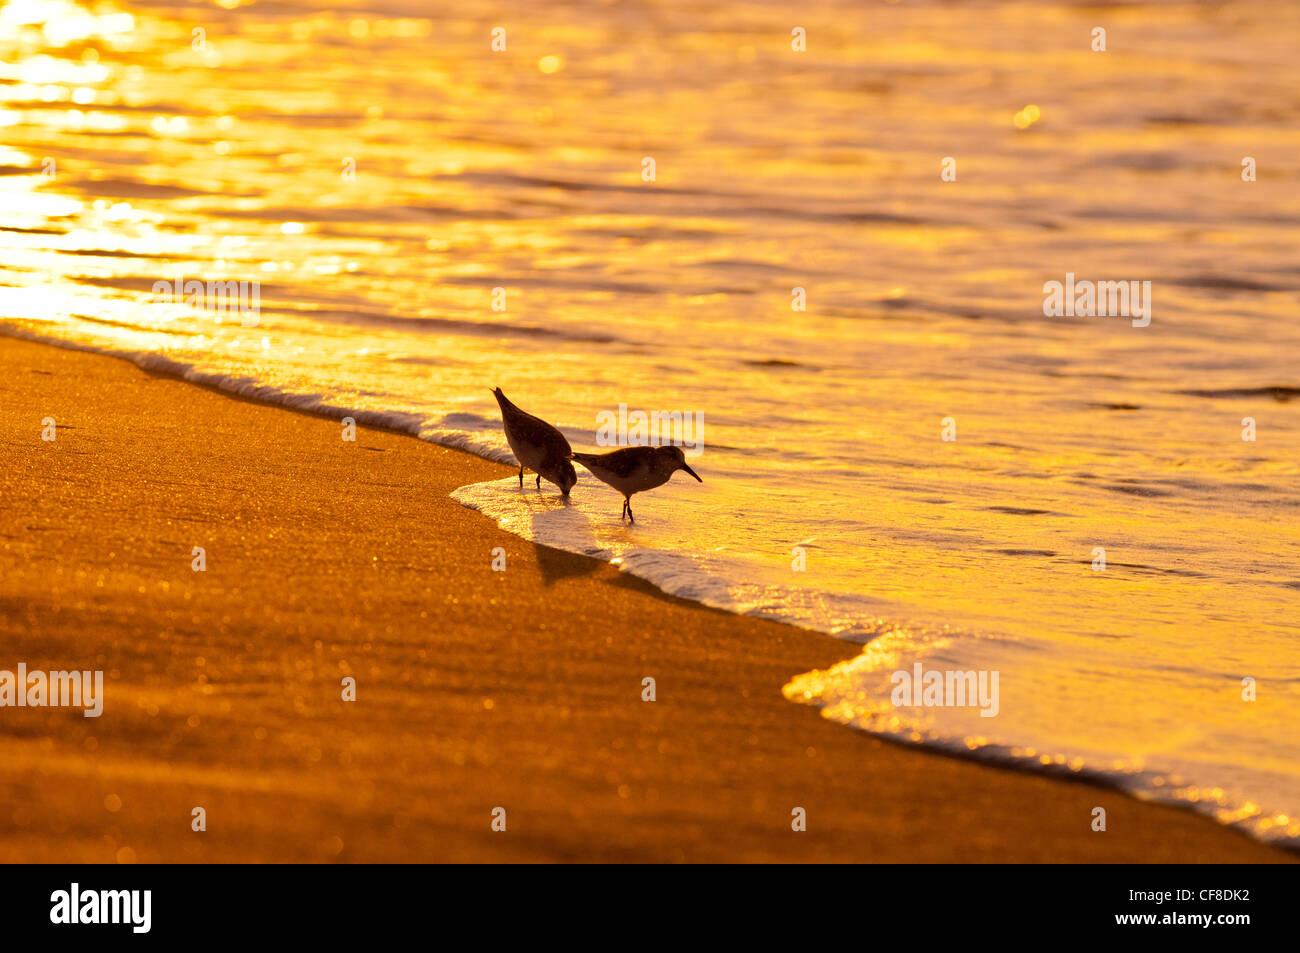 "Les Bécasseaux sanderling-'Hunakai"" en langue hawaiienne (Calidris alba), Polihale Beach, Kauai, Hawaii Photo Stock"